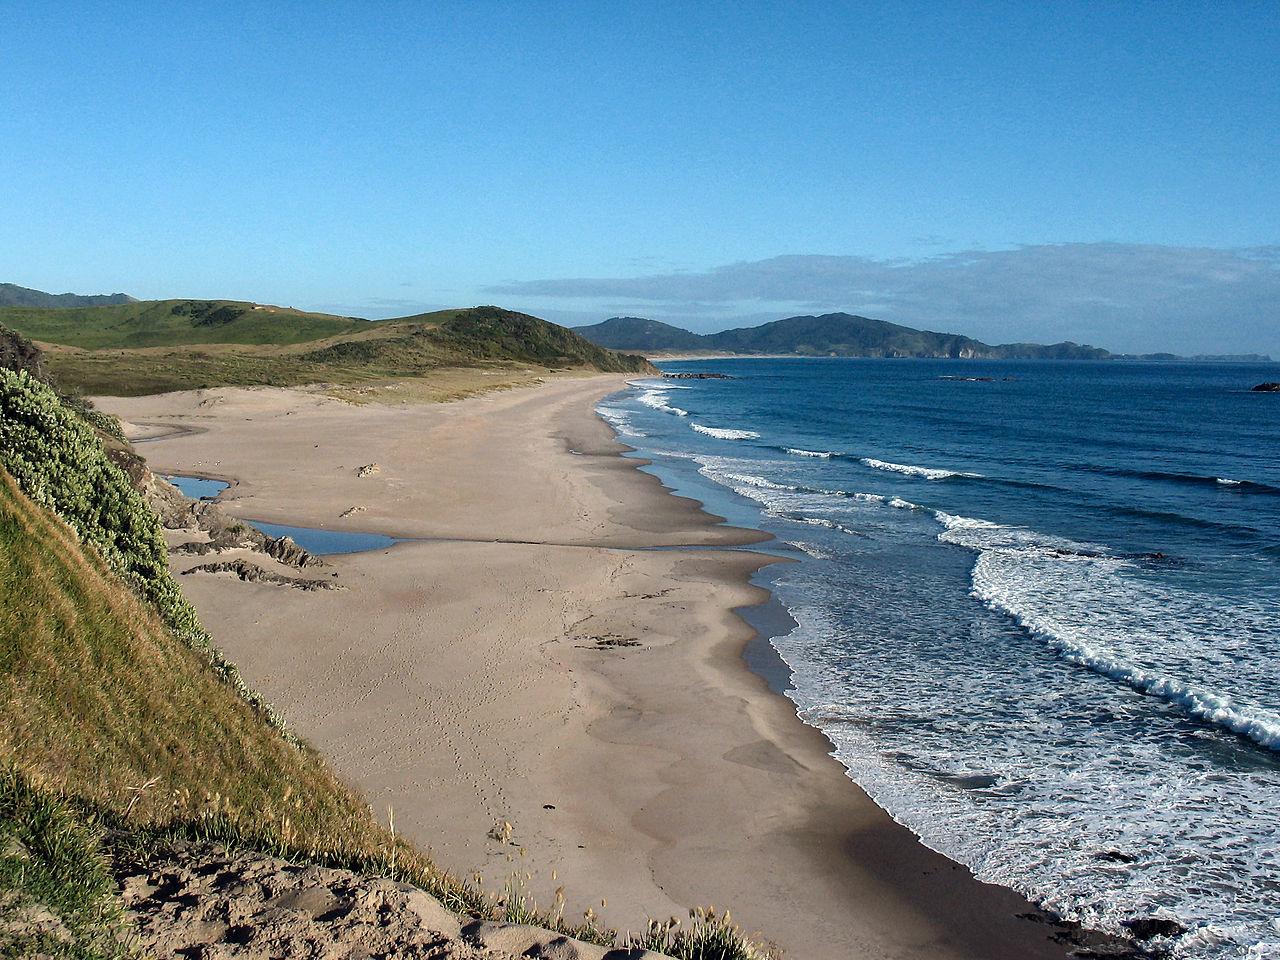 https://upload.wikimedia.org/wikipedia/commons/thumb/9/96/Ocean_Beach%2C_Northland%2C_New_Zealand2.jpg/1280px-Ocean_Beach%2C_Northland%2C_New_Zealand2.jpg